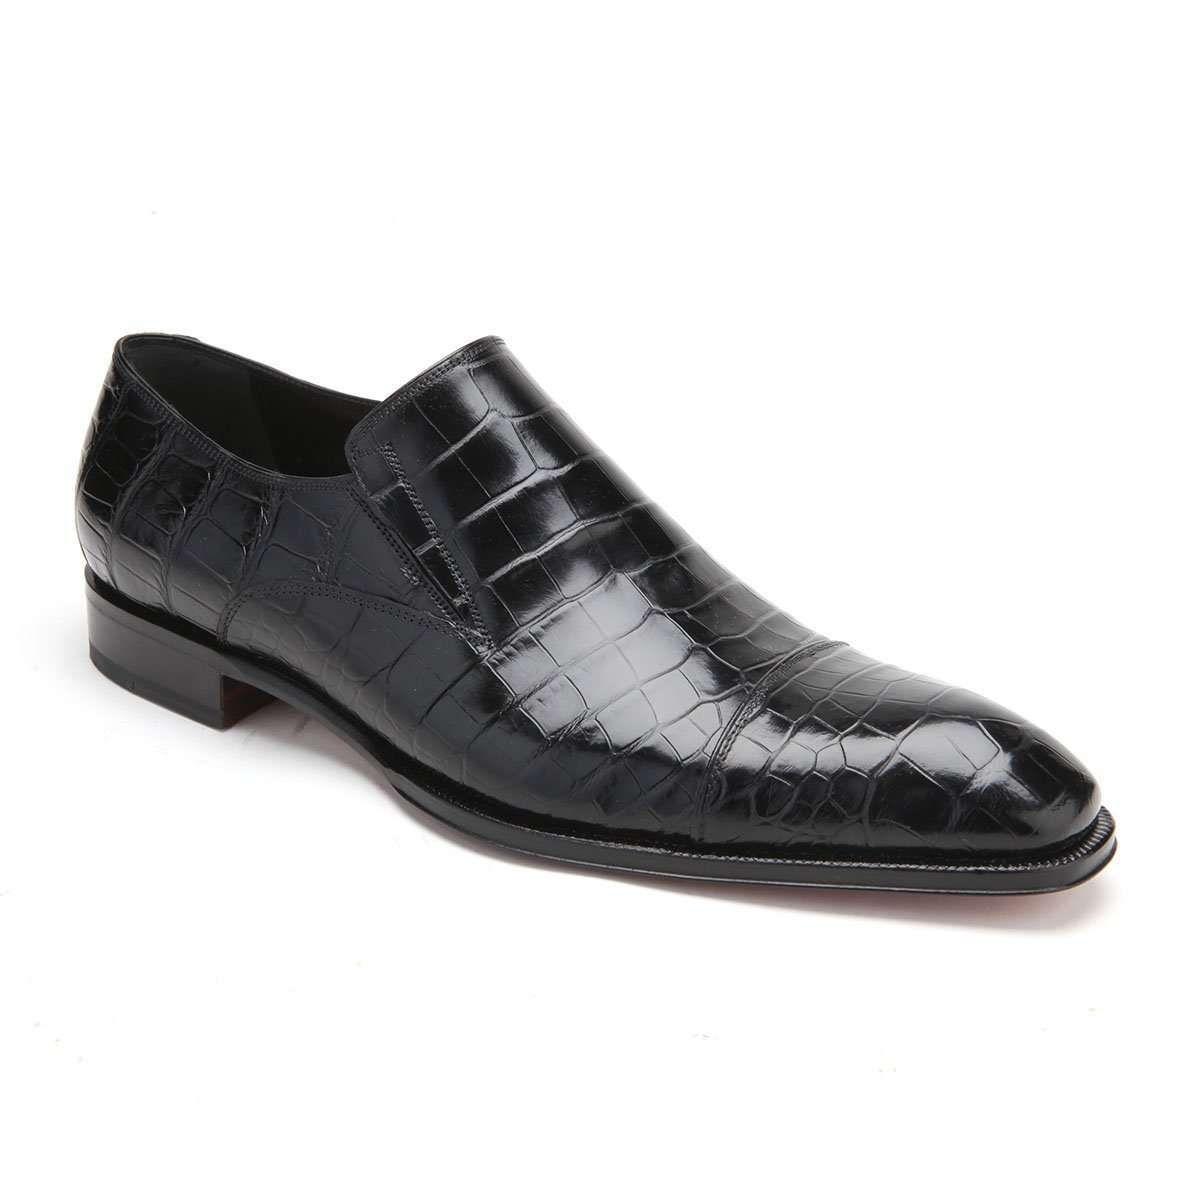 Caporicci Men S Luxury Italian Designer Shoes Black Alligator Loafers Art943 Cap1028 In 2021 Italian Shoes For Men Mens Shoes Black Dress Shoes Men [ 1200 x 1200 Pixel ]